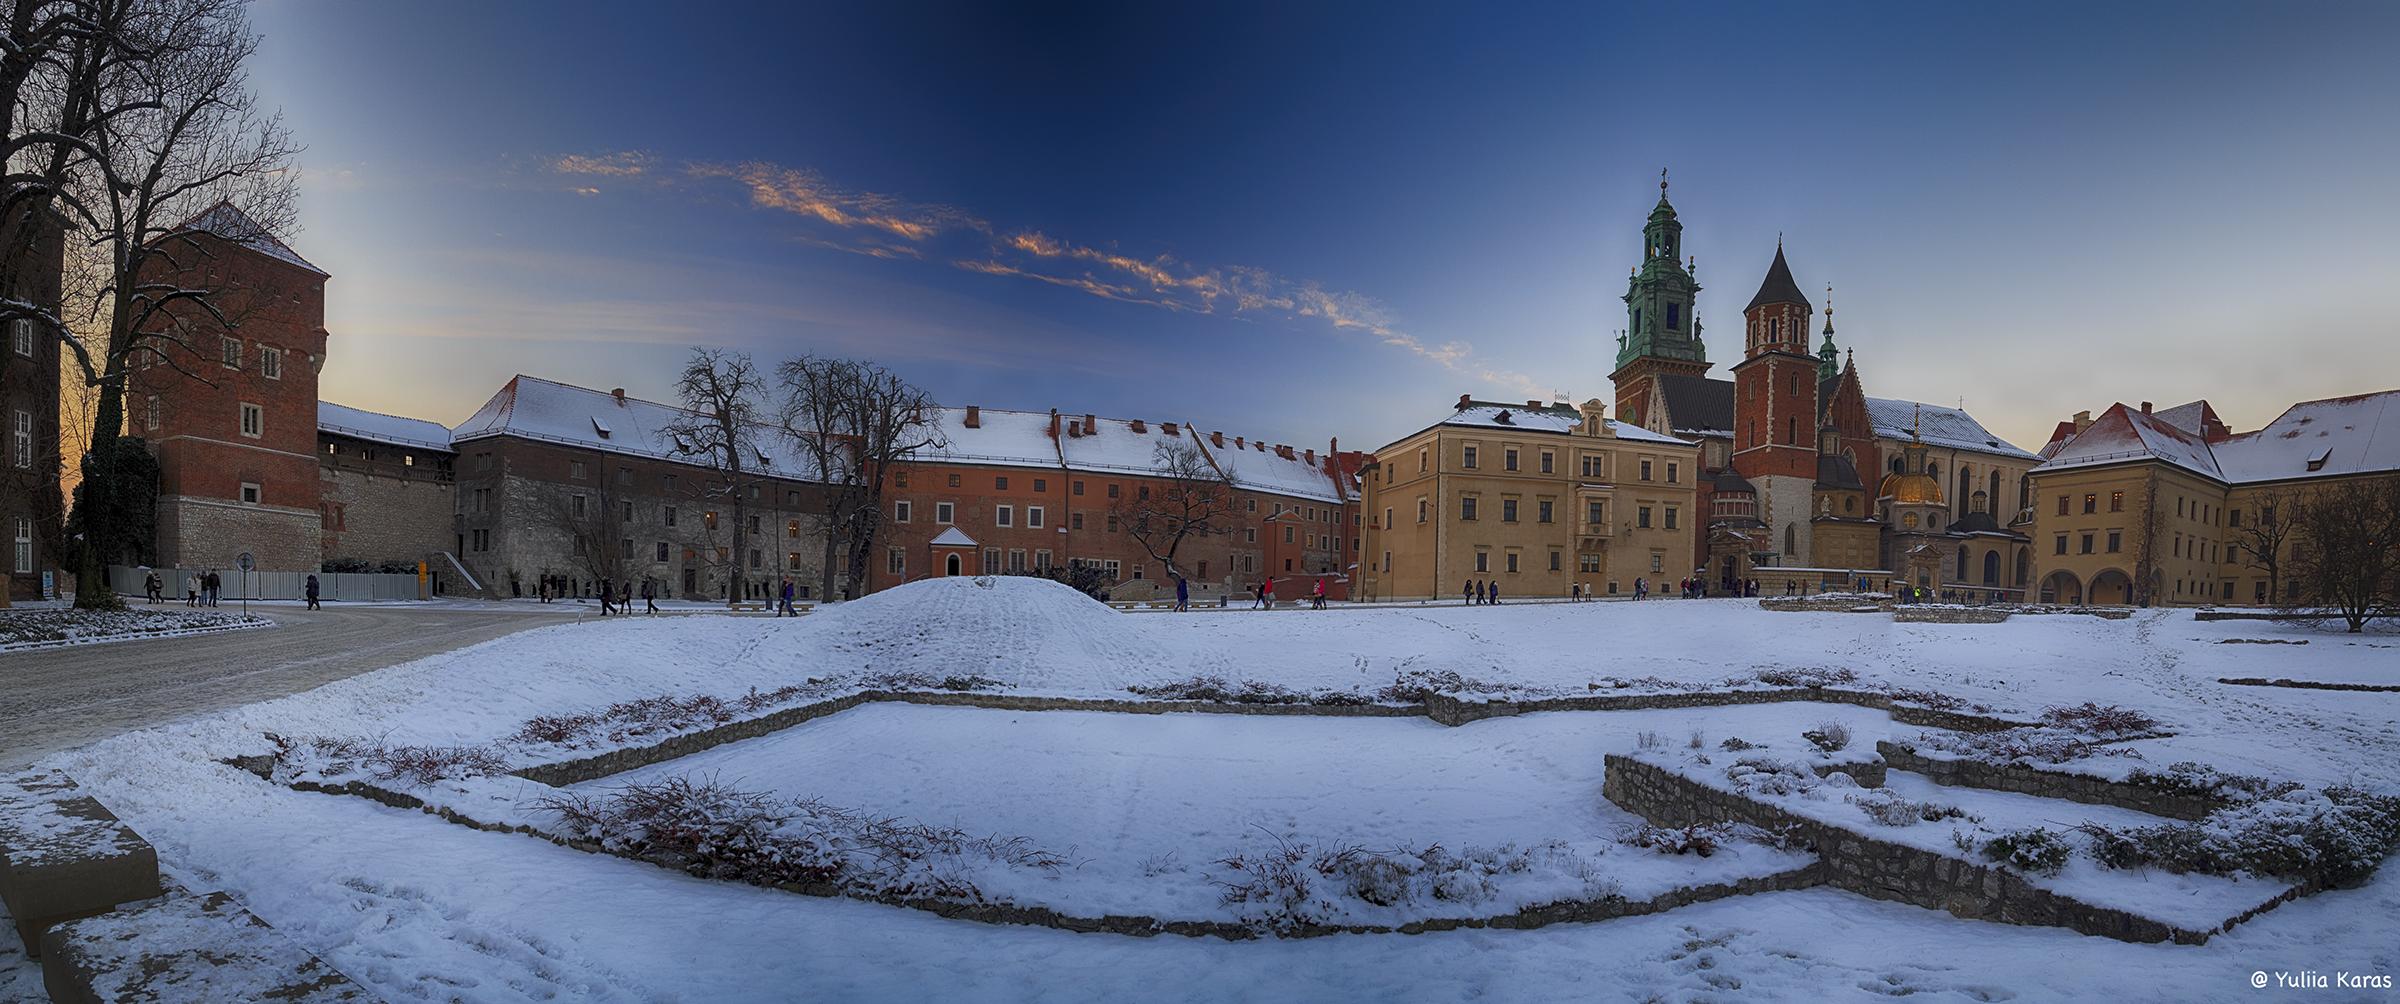 IMG_4621 Panorama